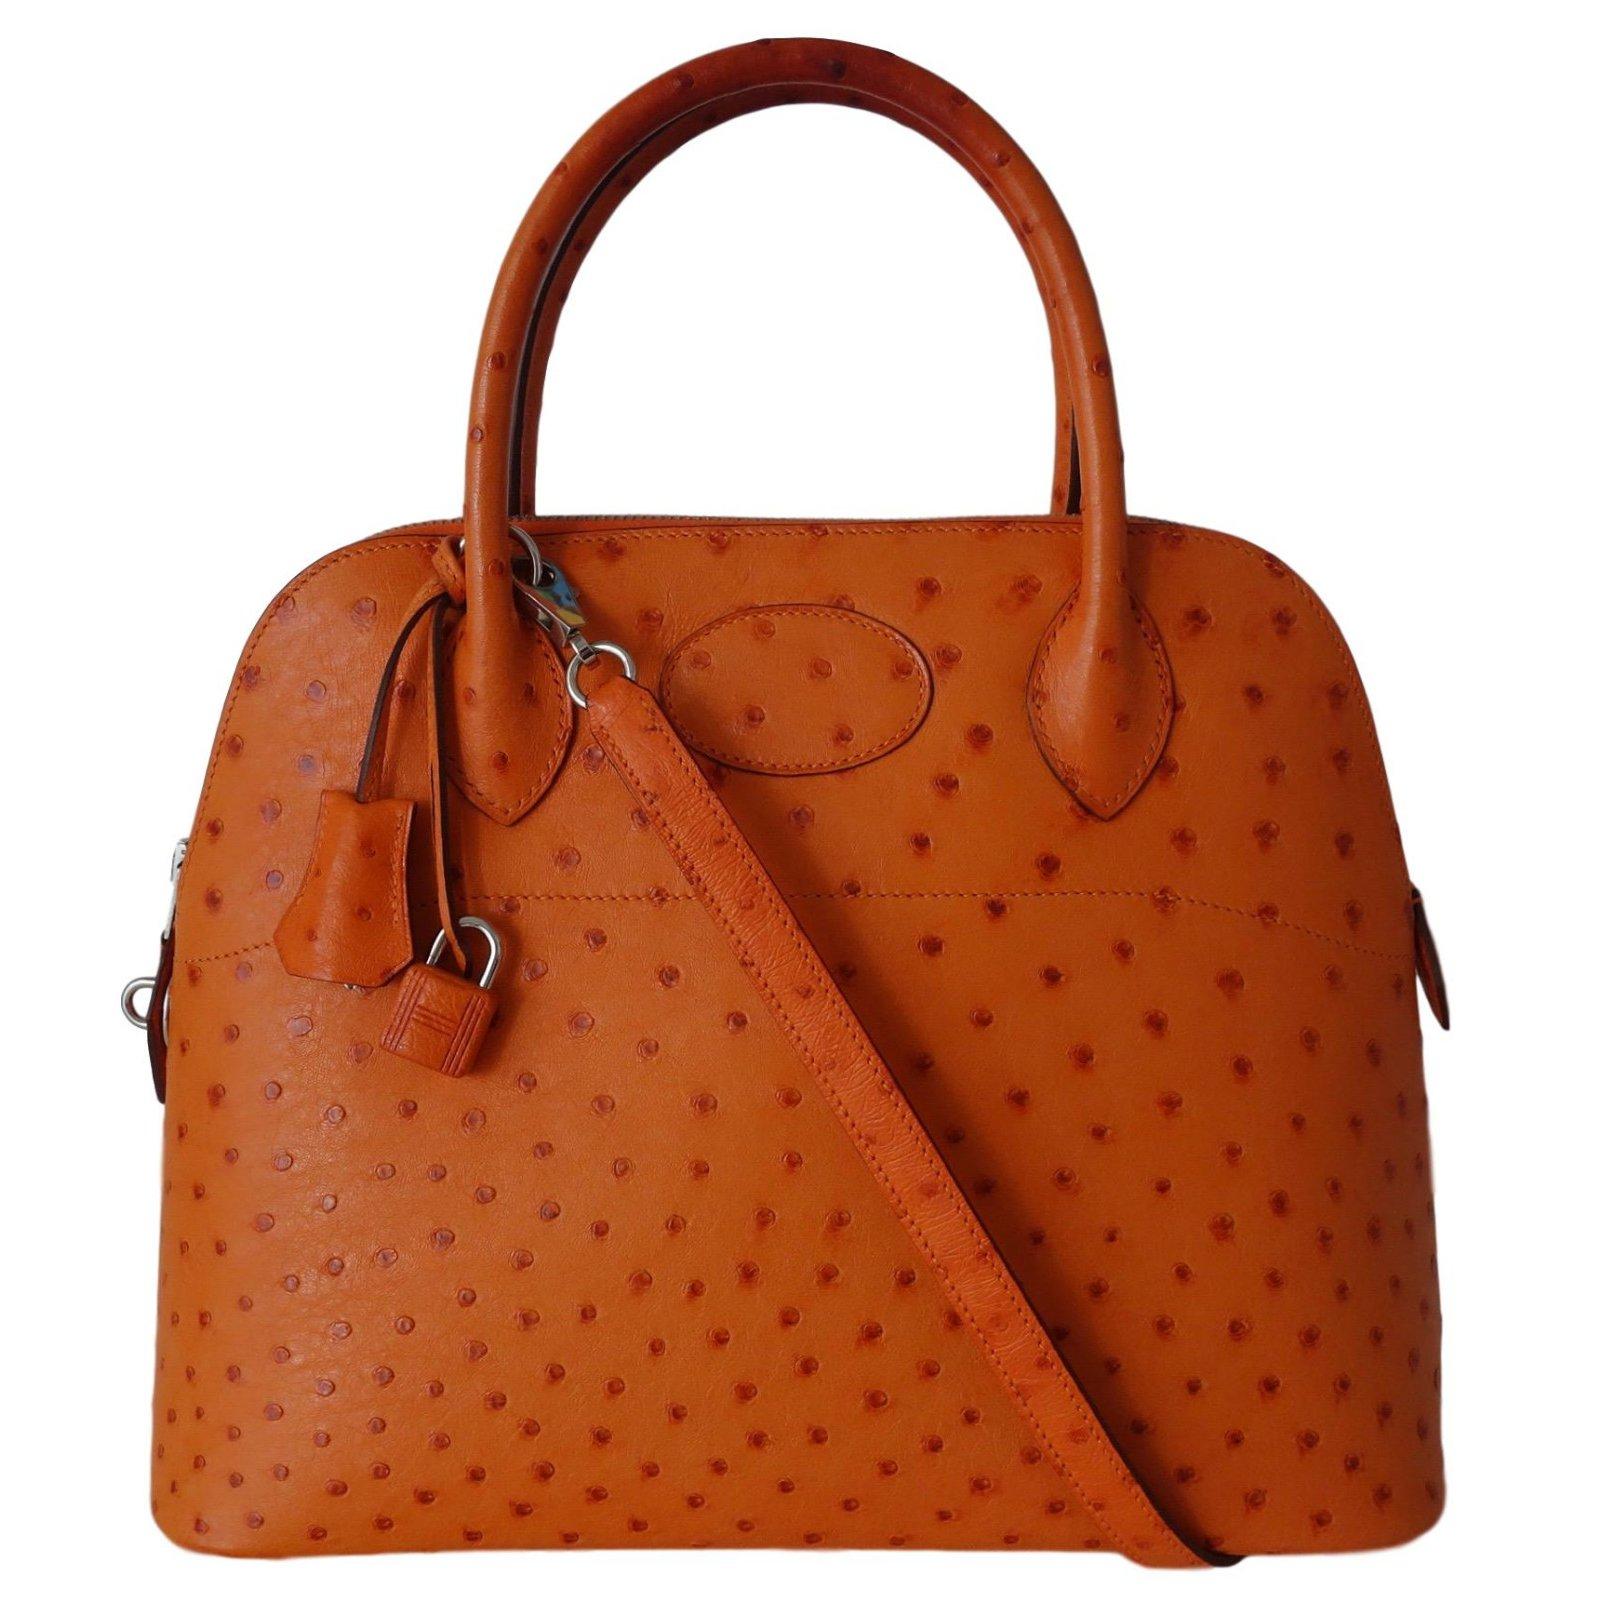 Hermès Bolide 31 Ostrich Leather Handbags Exotic Orange Ref 69994